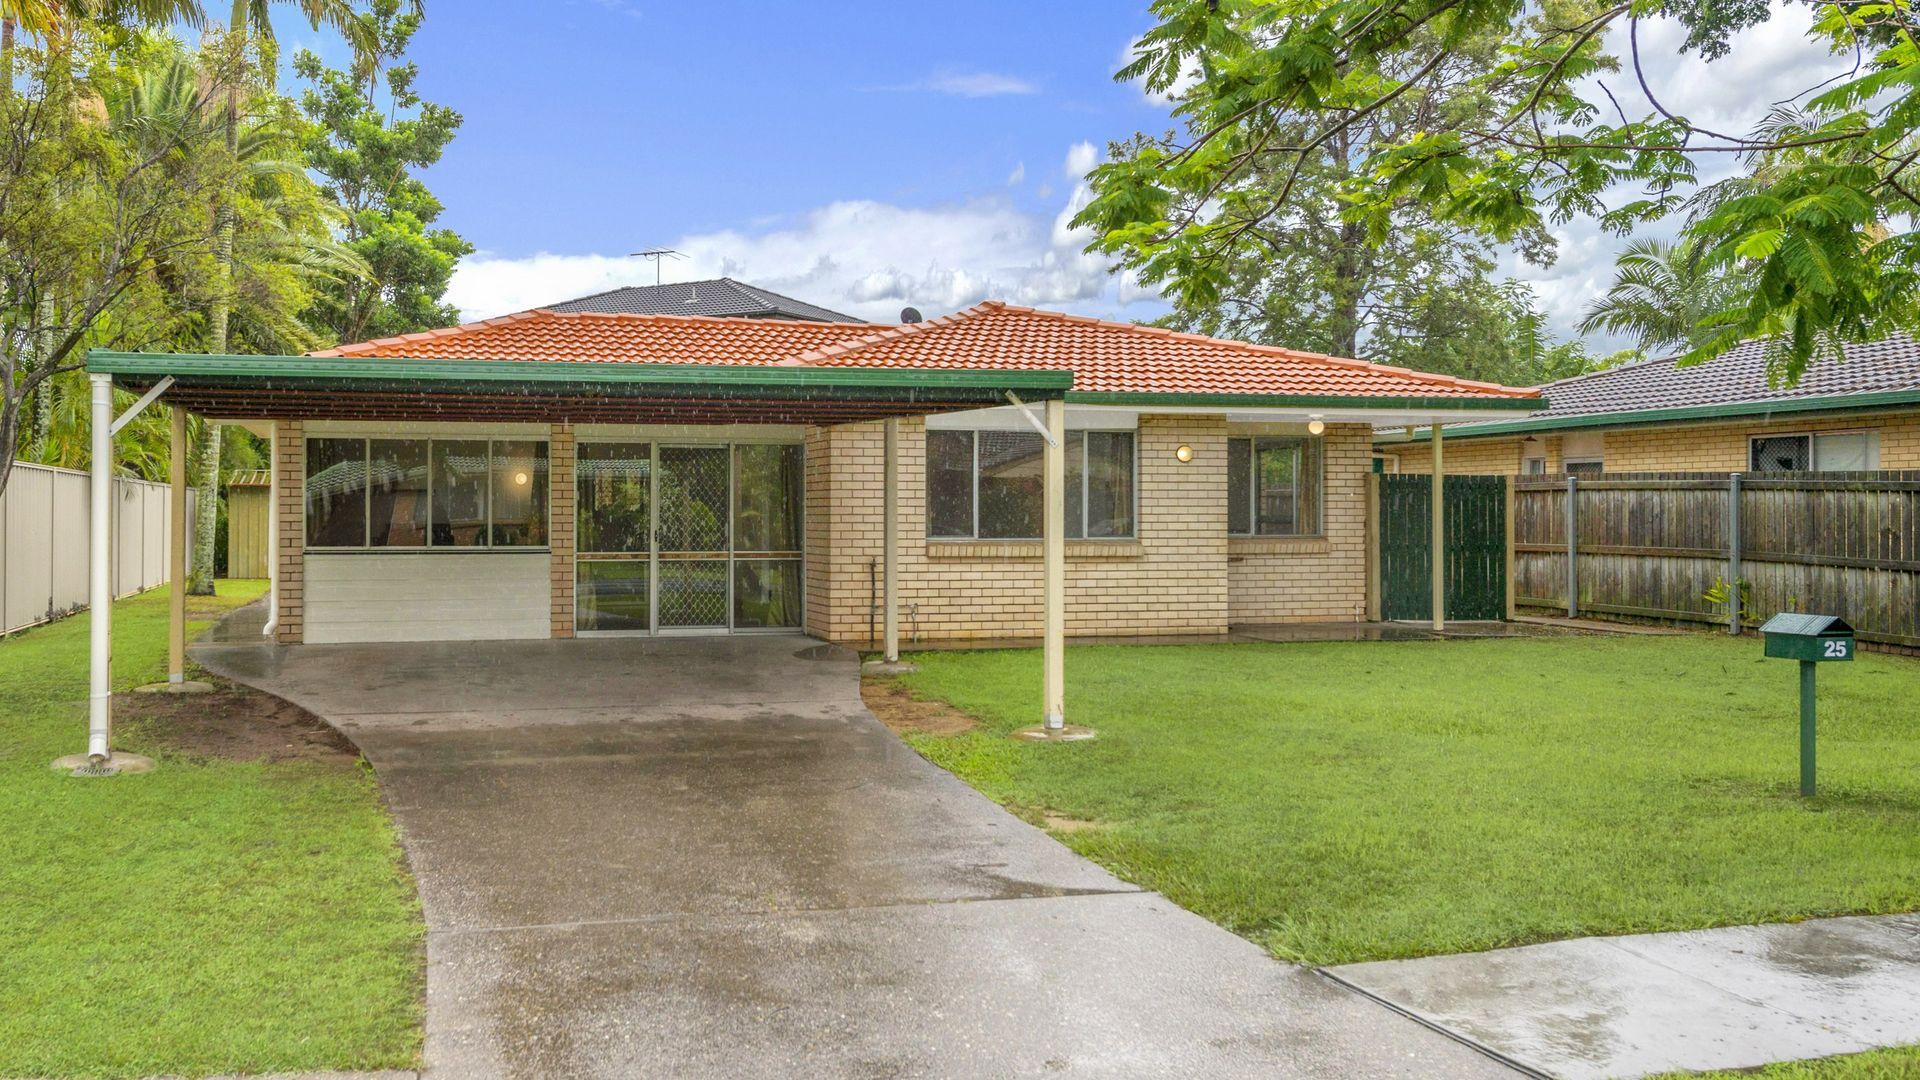 25 Alkeeba Street, Banyo QLD 4014, Image 1